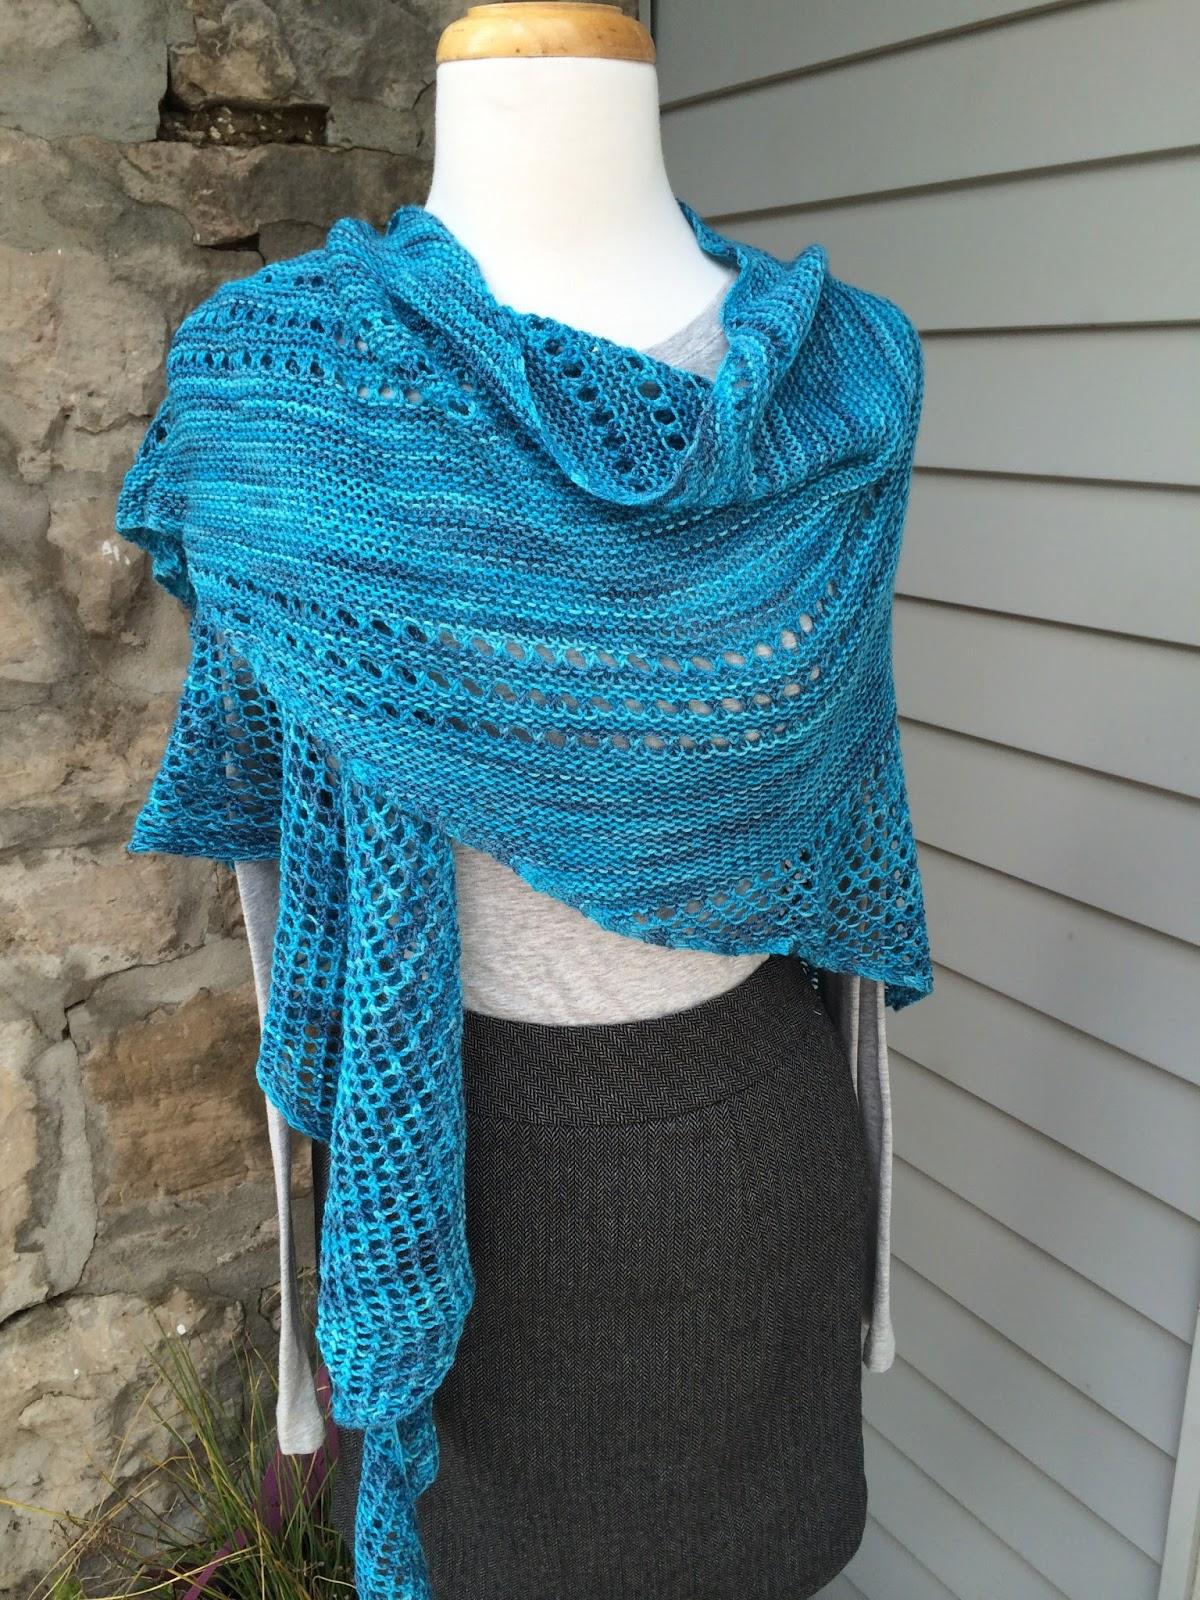 A Really Good Yarn: Perfect TV Knitting